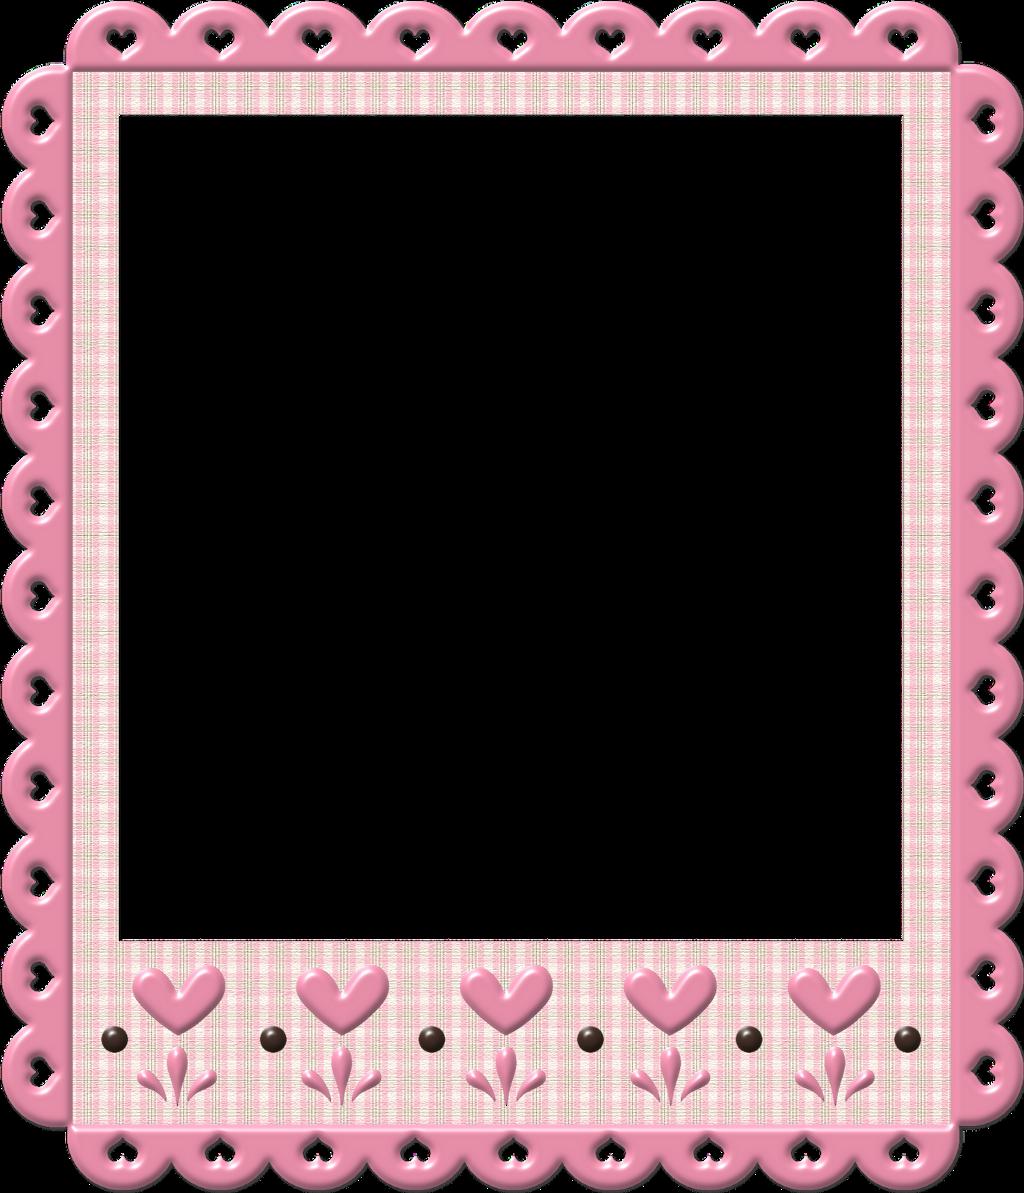 #pink #frame #hearts